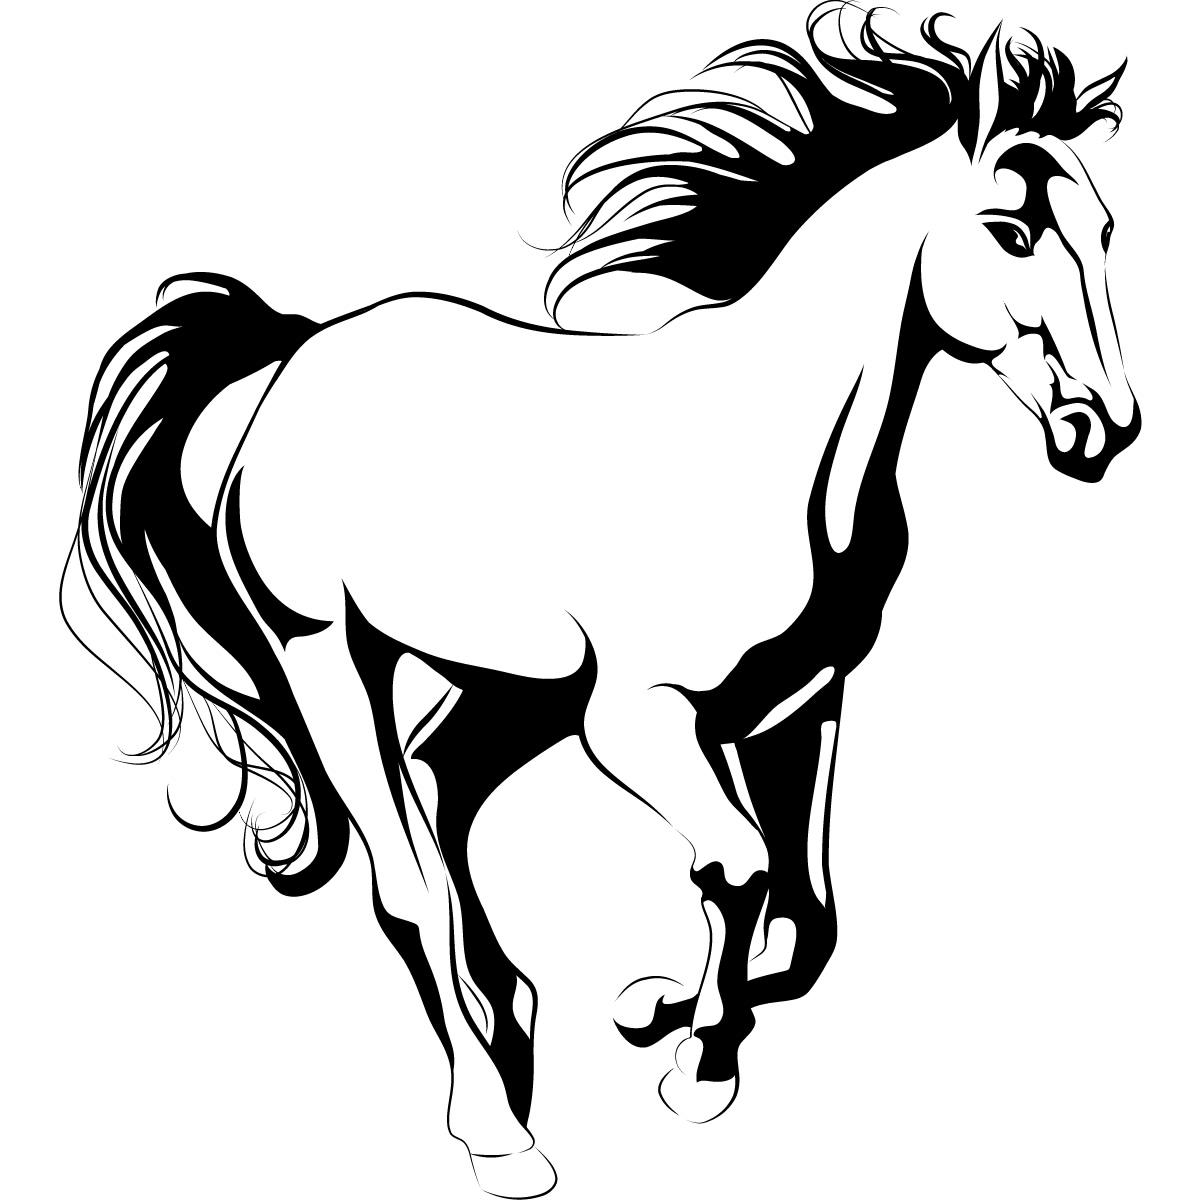 Running Horse Animals Wall Art Sticker Decal Transfers